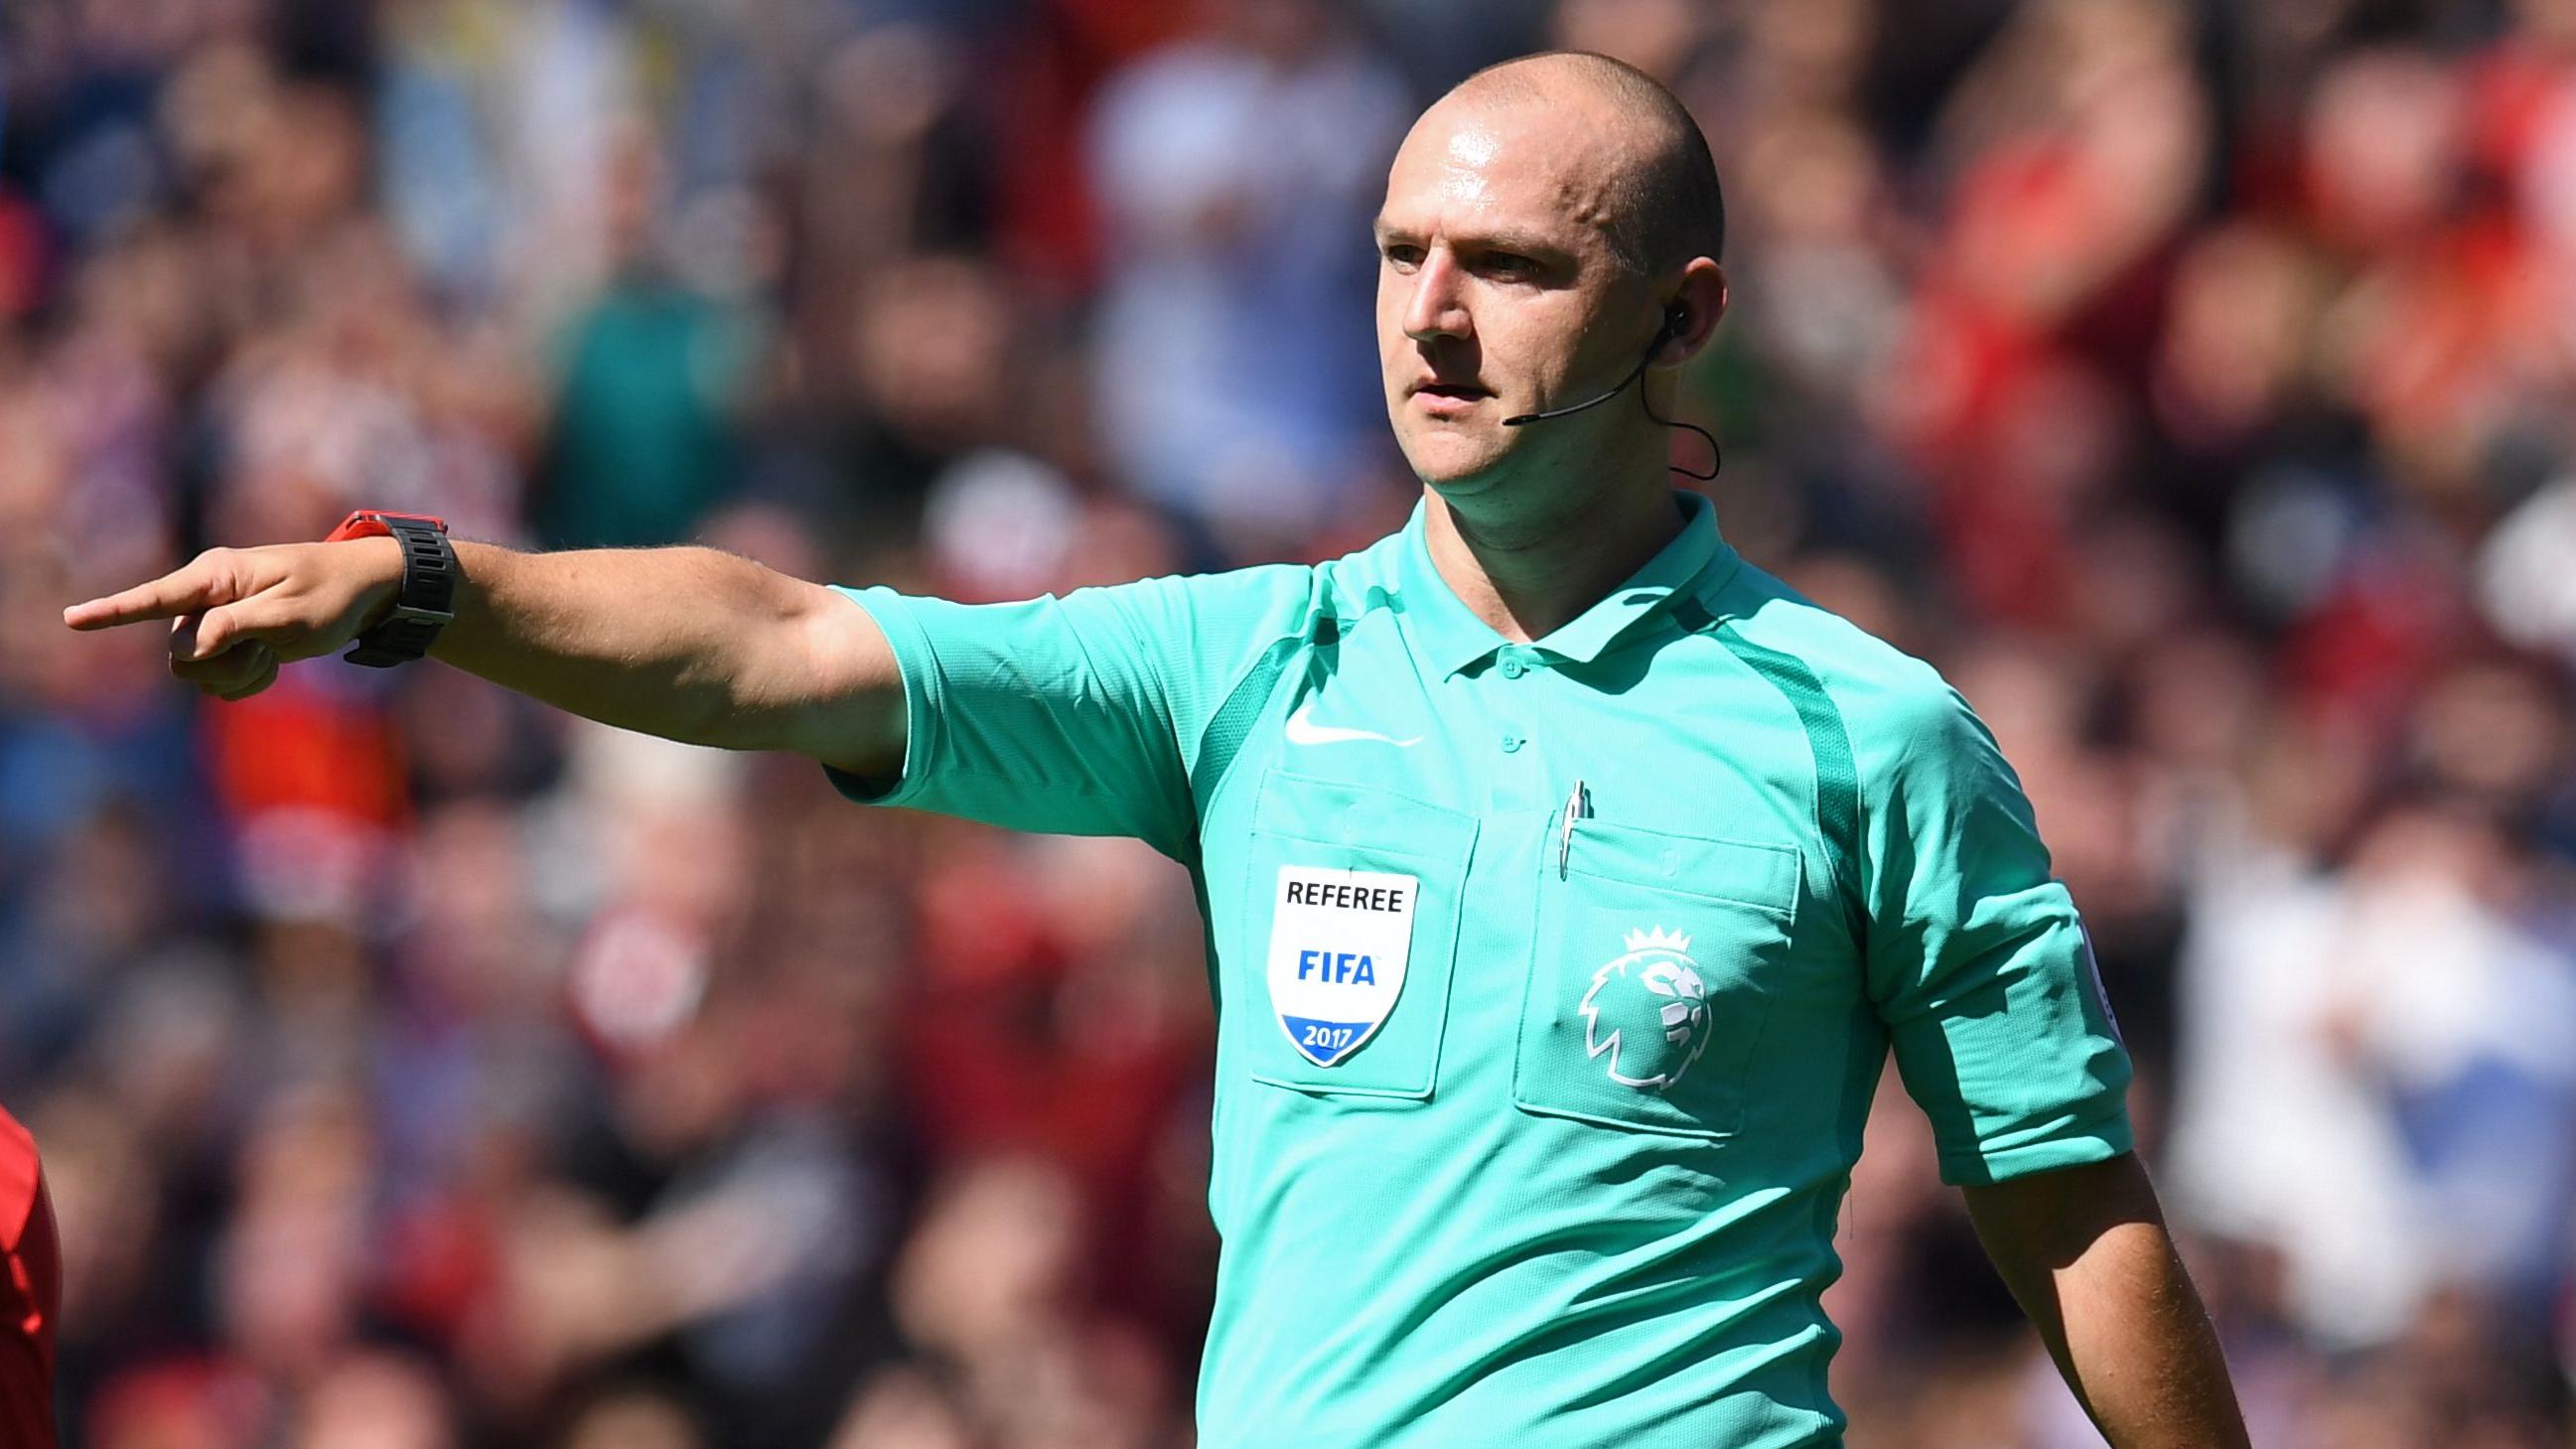 Former Premier League referee Bobby Madley reveals sacking for discriminatory 'joke' video